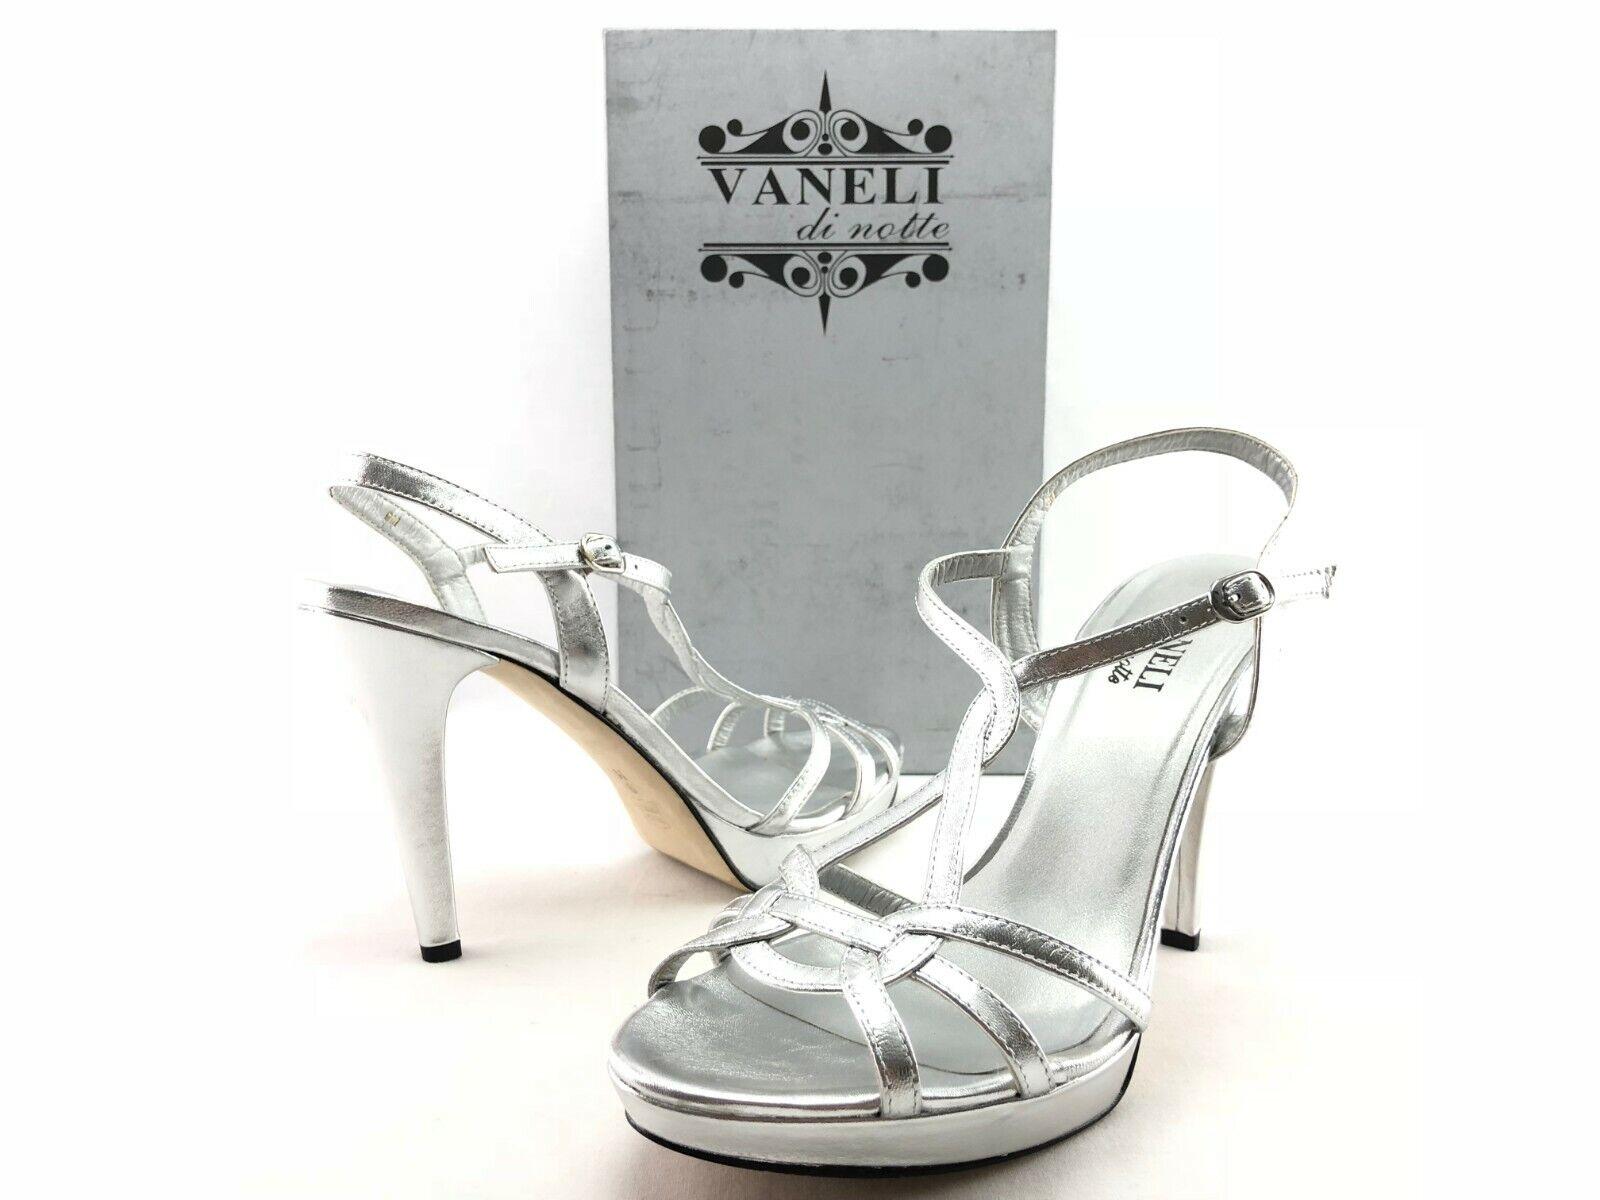 VANELi Qamar Women's Silver Strappy Dress Dress Dress Sandals Heels US 9 M shoes C105 8af4a2